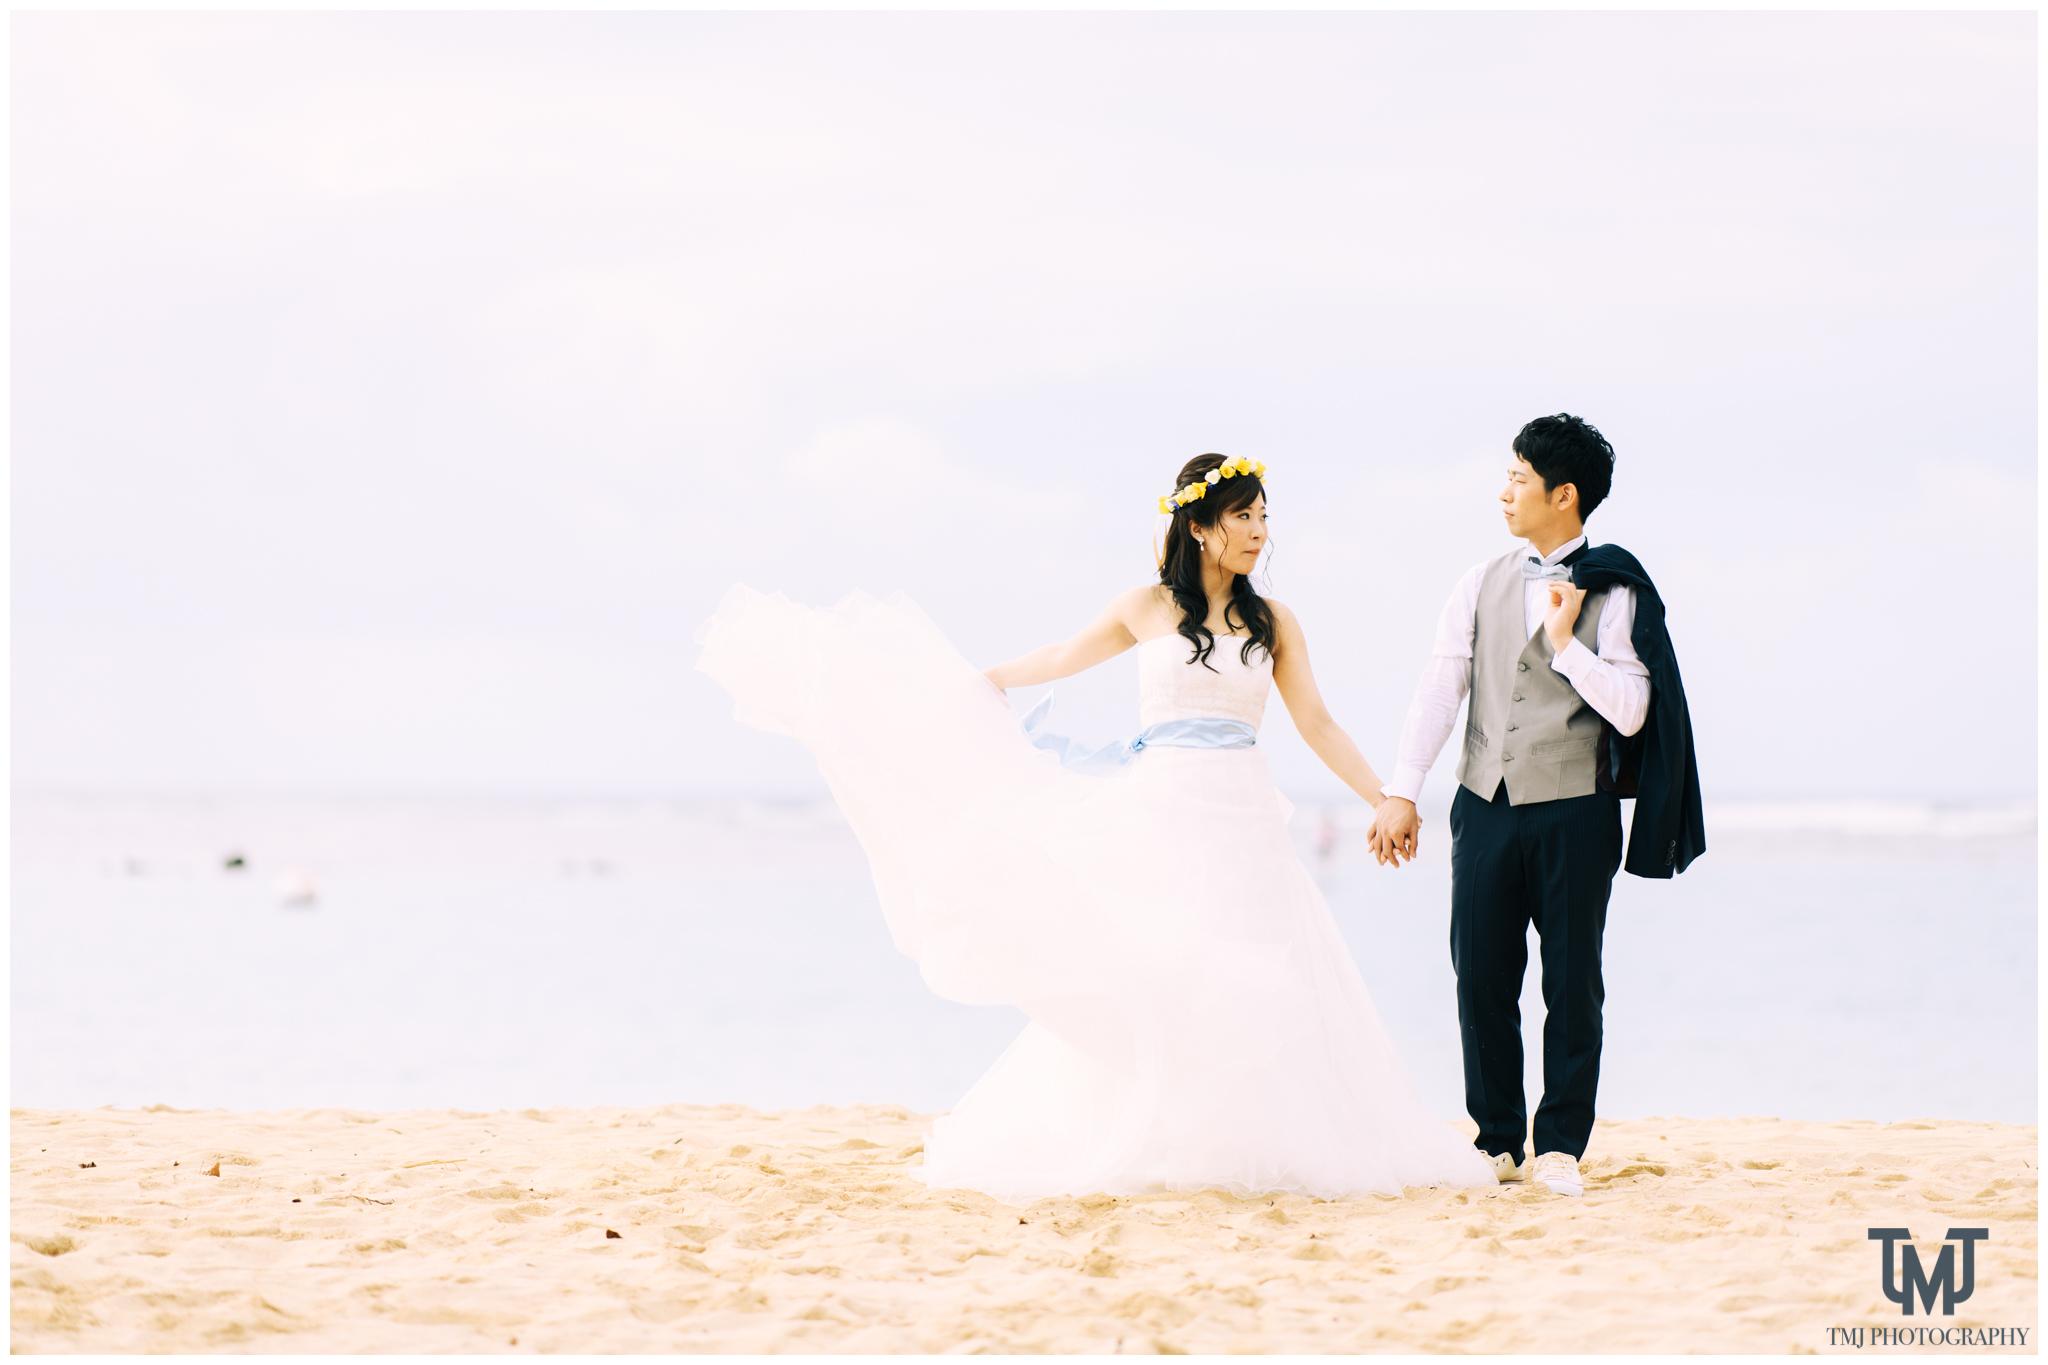 Moana Surfrider Terrace By The Sea Honolulu Destination Wedding 024.jpg